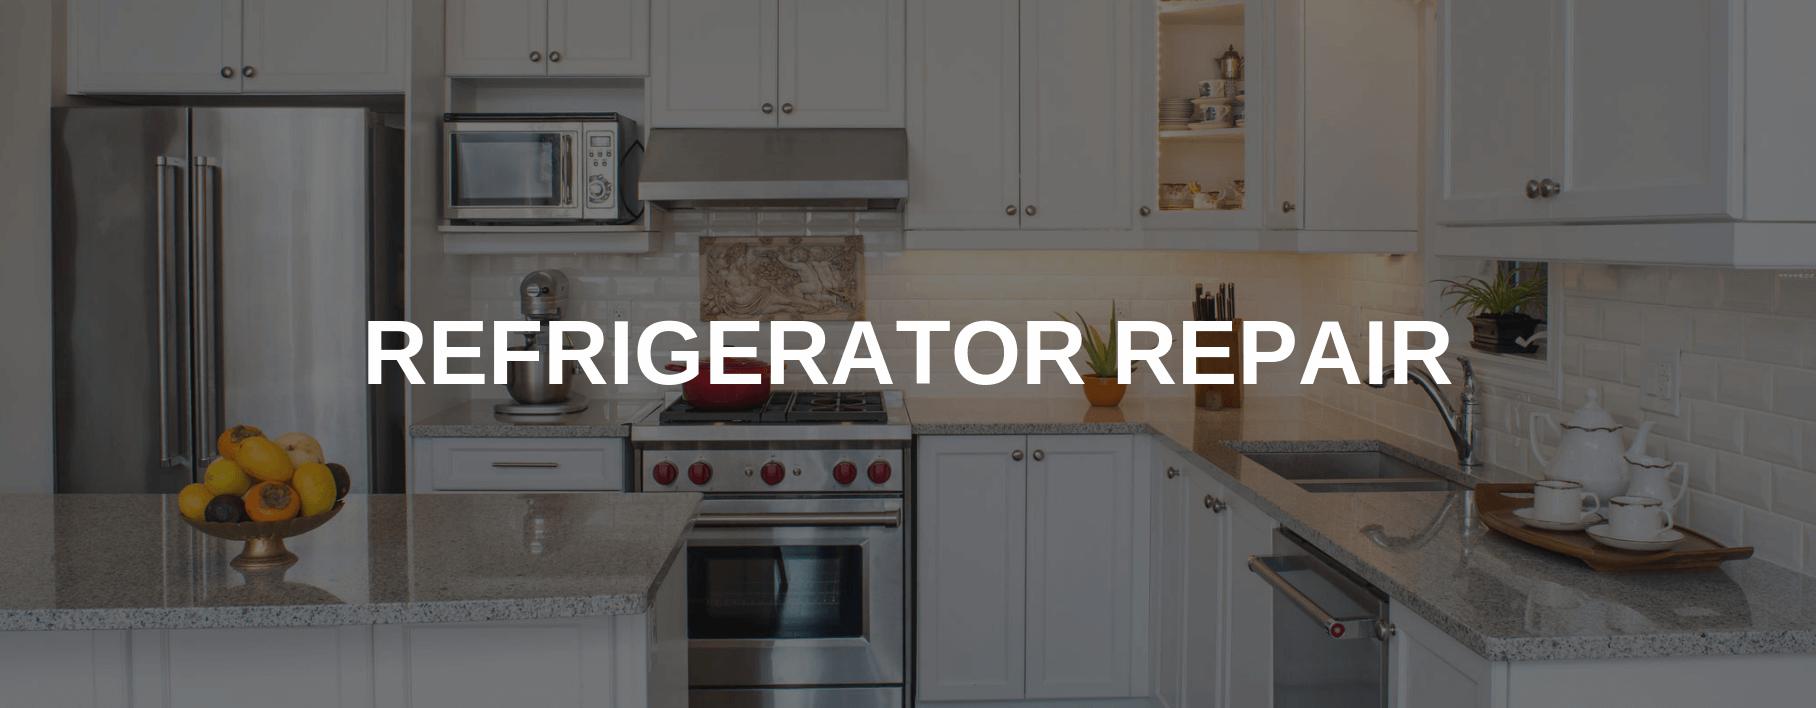 refrigerator repair chula vista